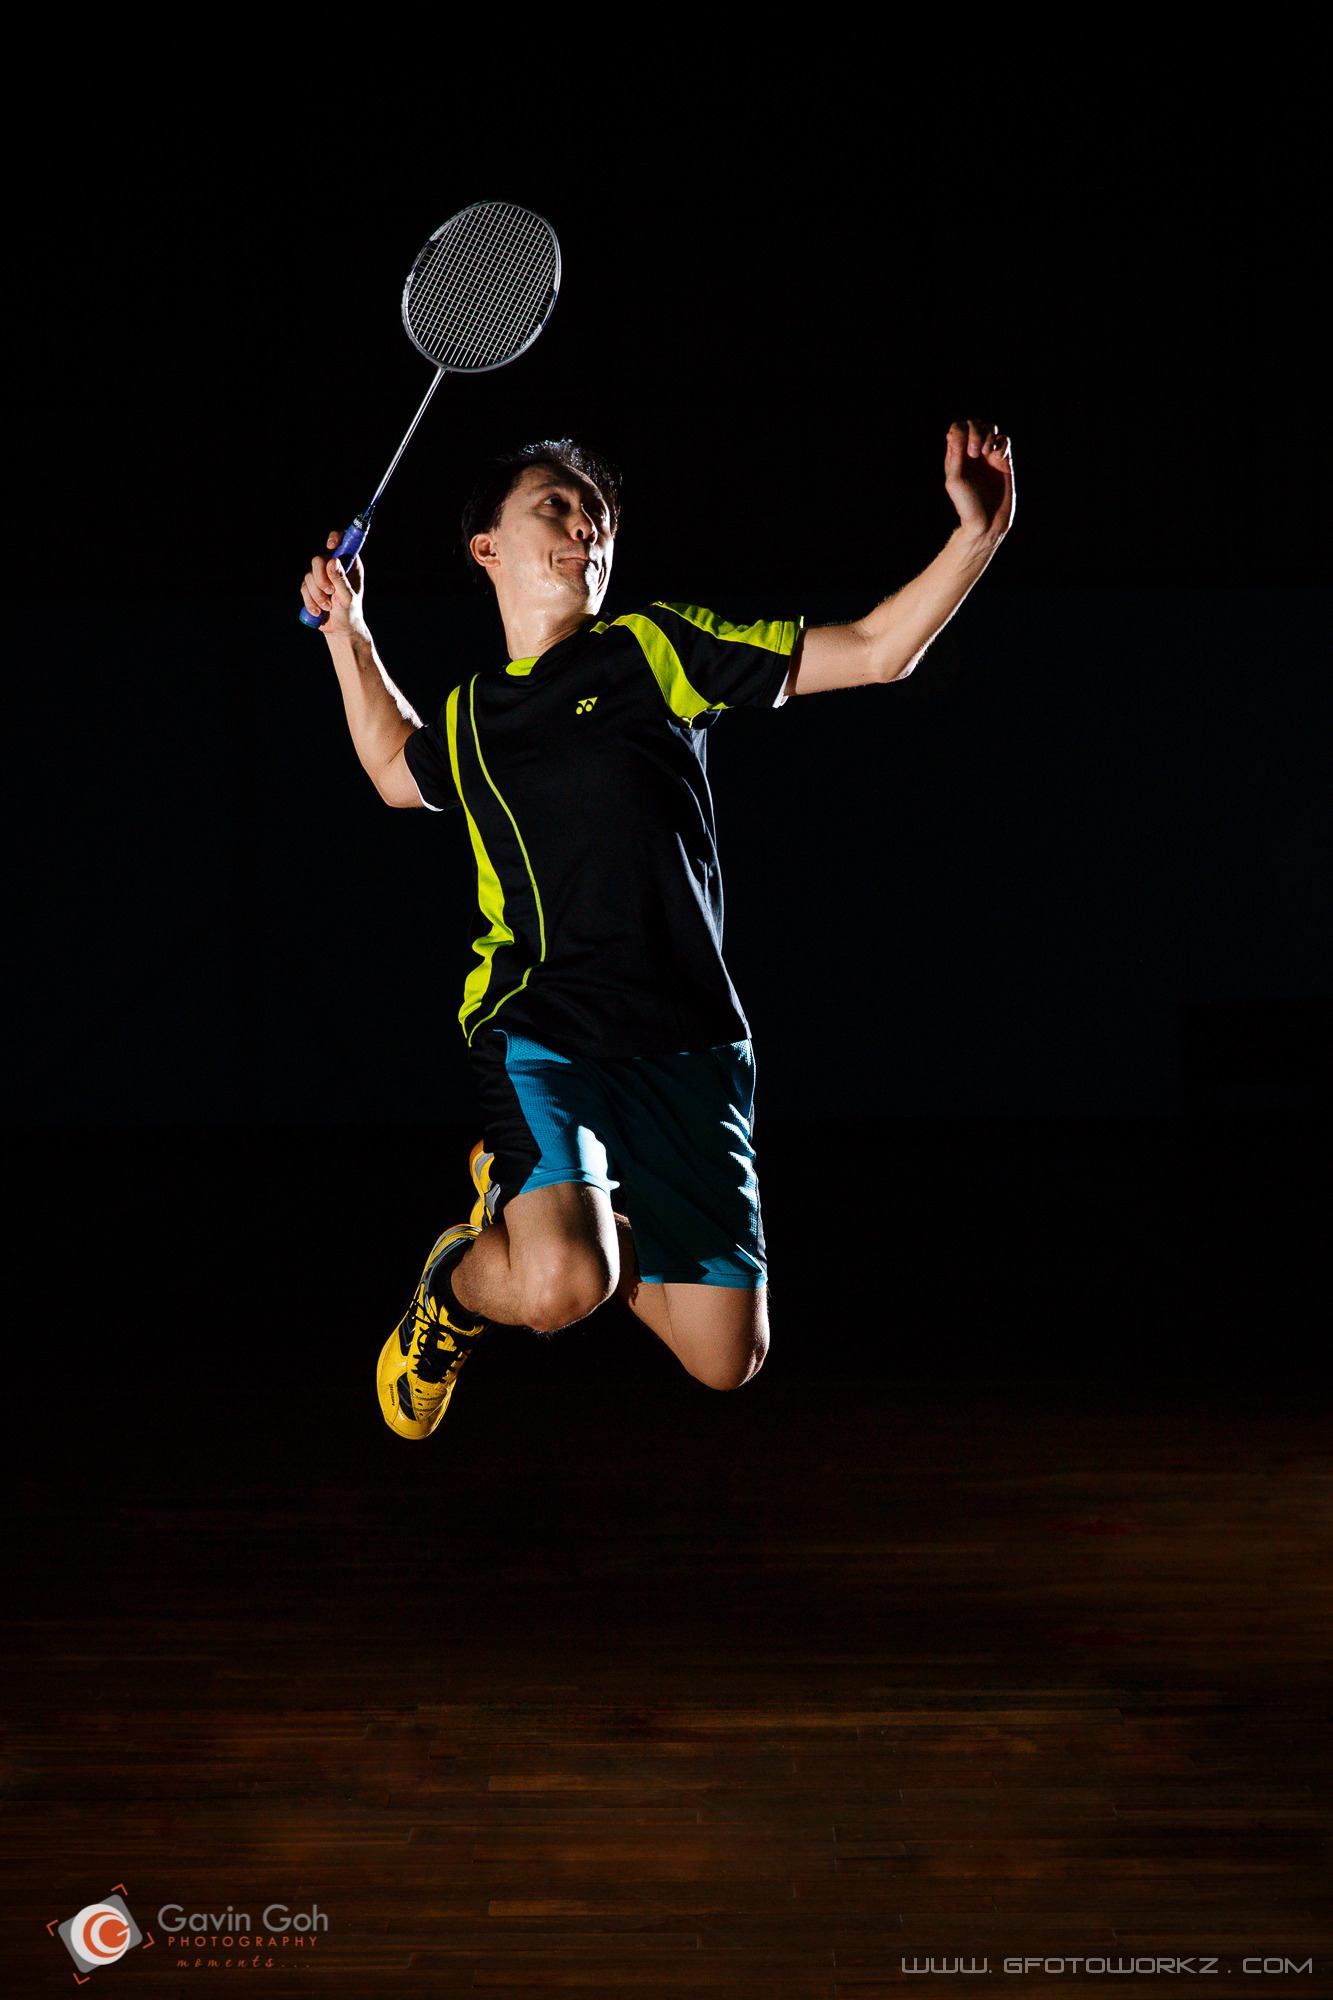 August | 2013 | Gavin Goh Photography Badminton